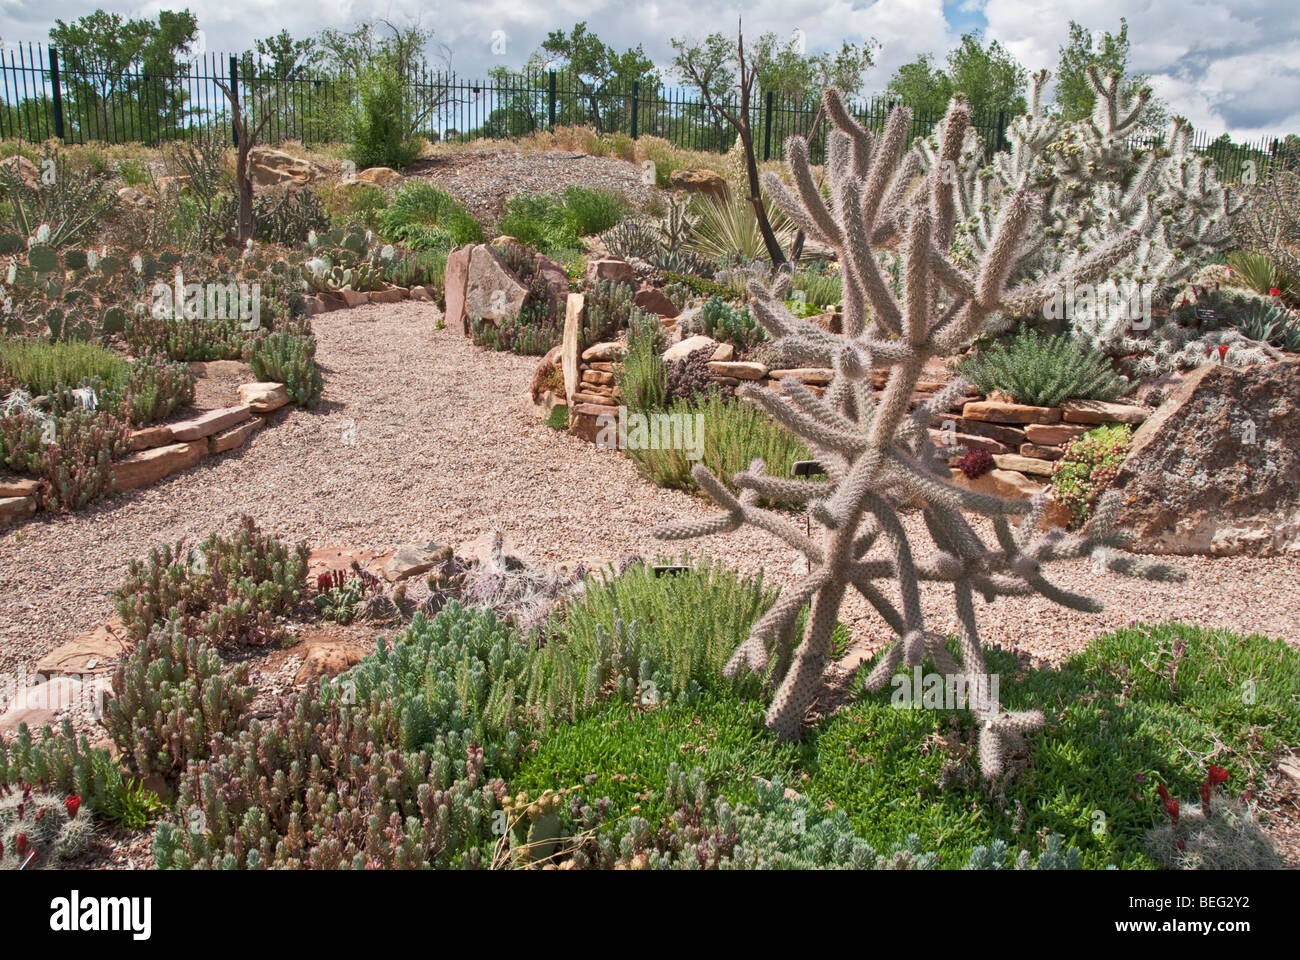 Colorado Grand Junction Western Colorado Botanical Gardens Stock Photo Royalty Free Image